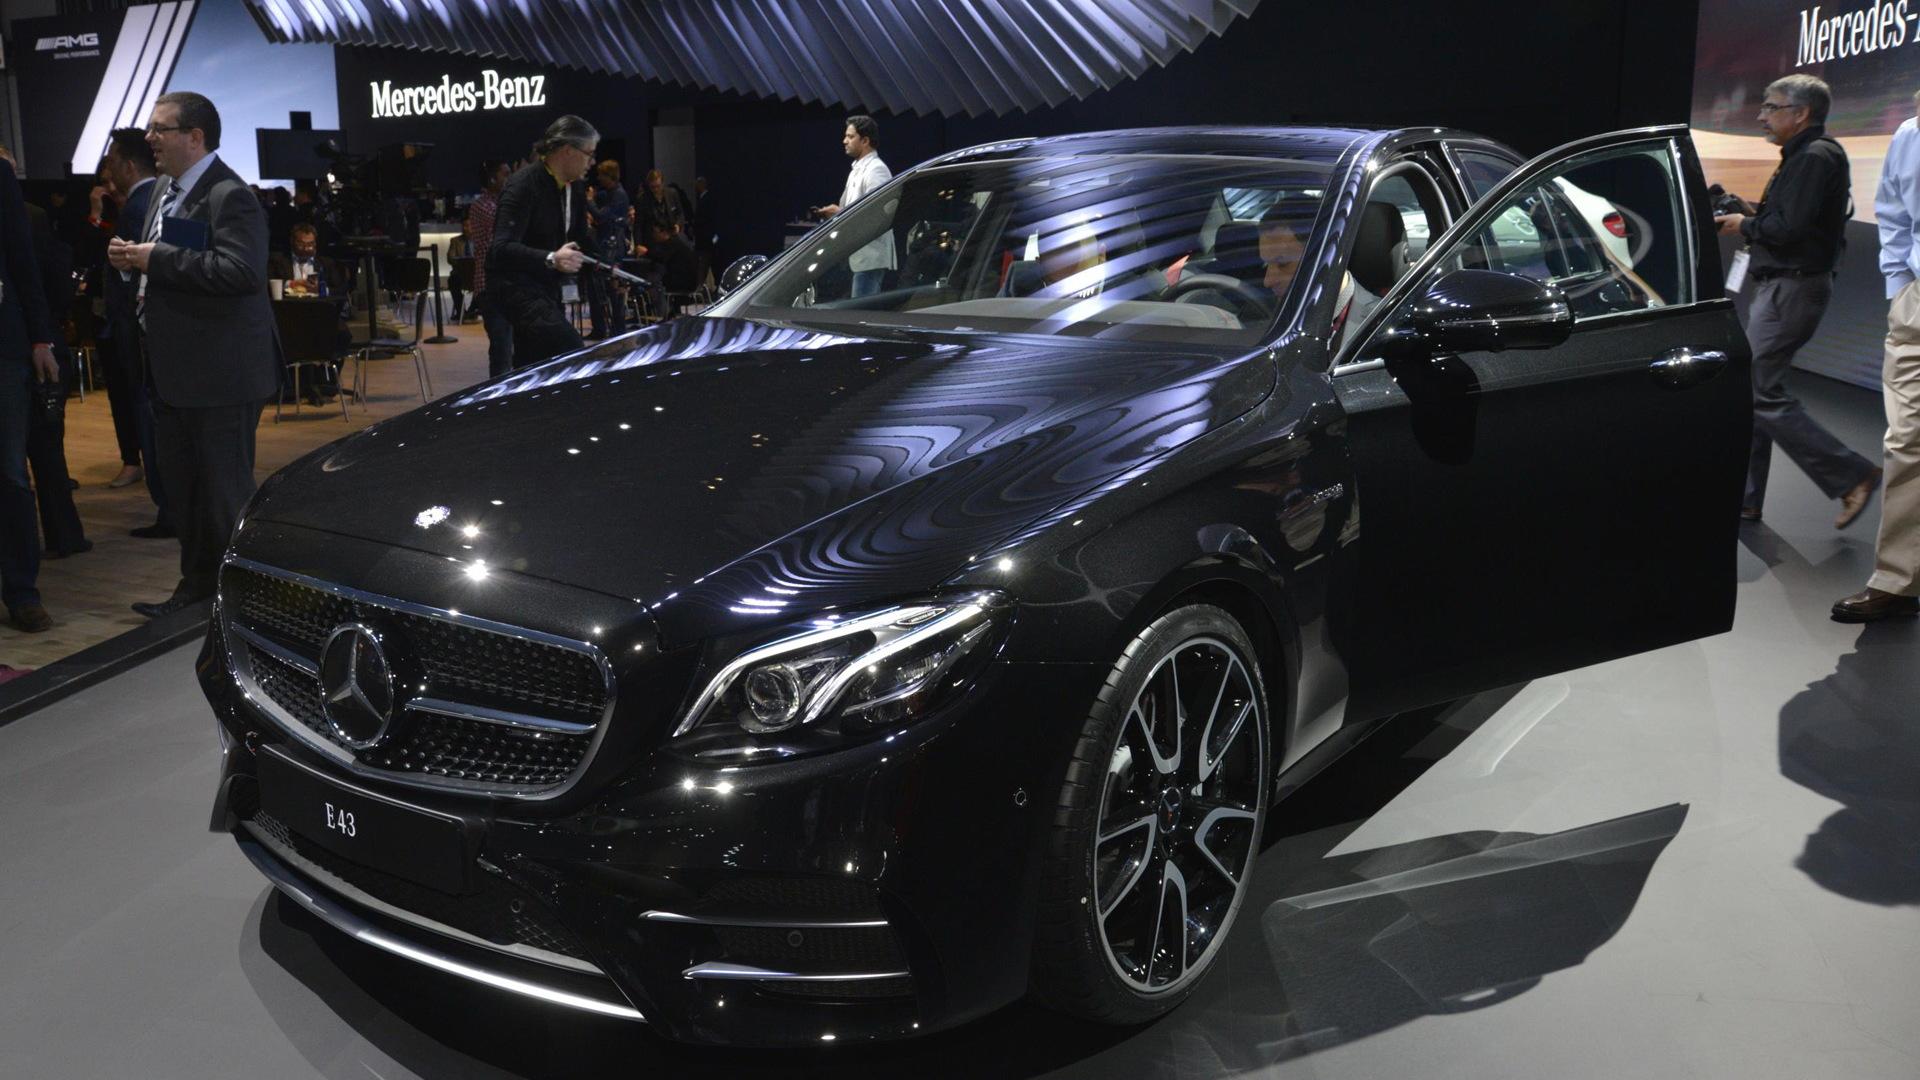 2017 Mercedes-AMG E43, 2016 New York Auto Show